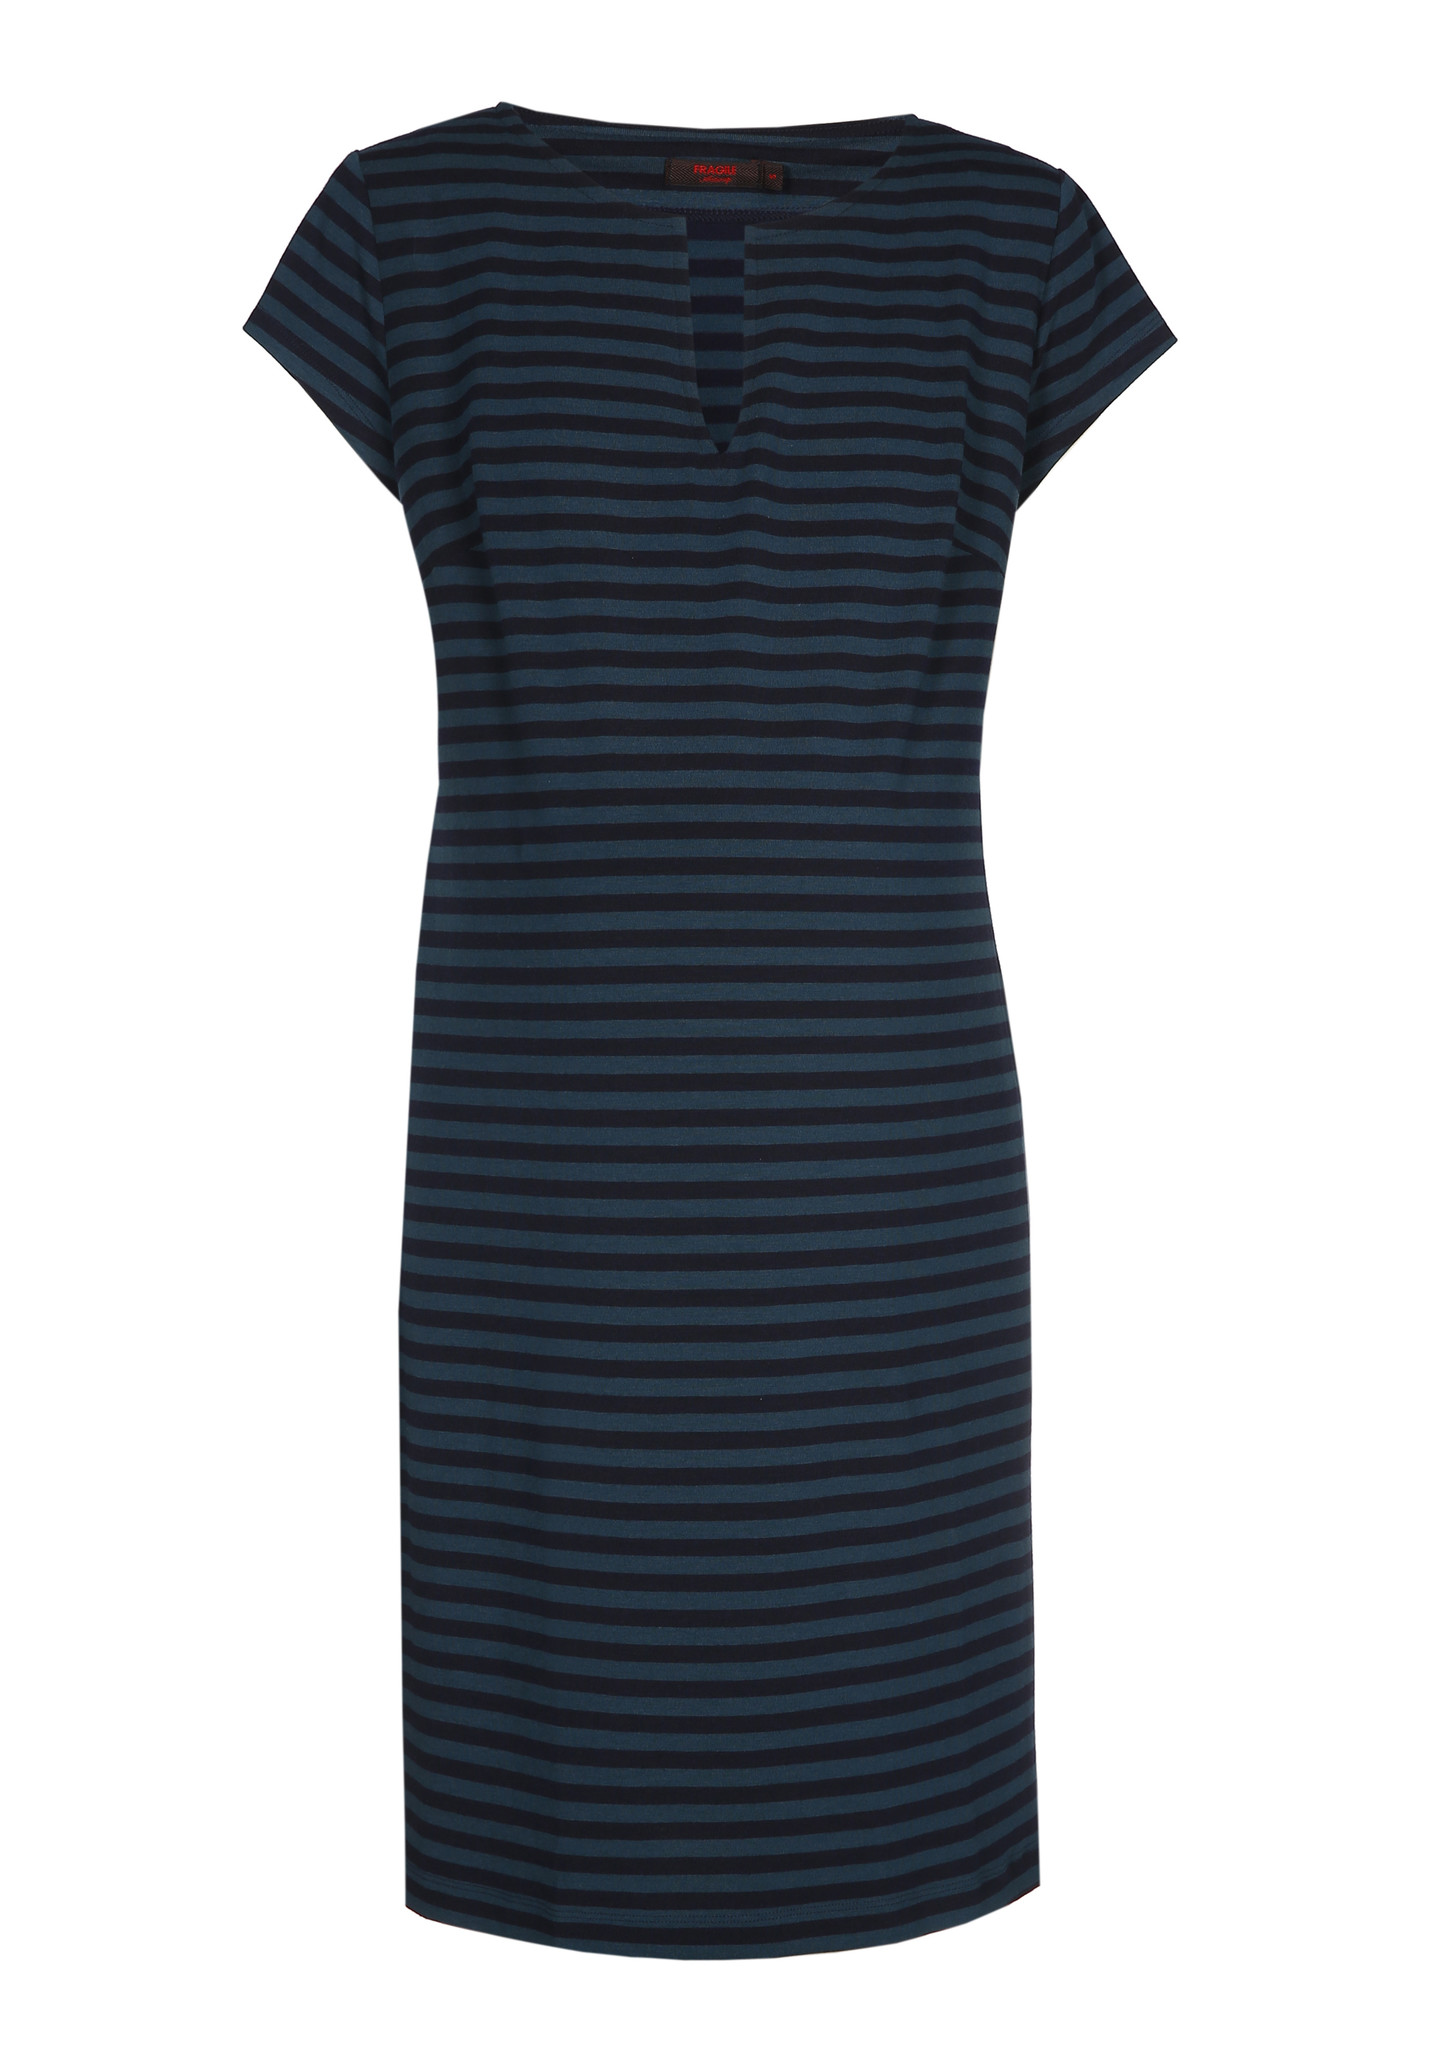 Slim tunic short sleeves - Petrol/Navy-1